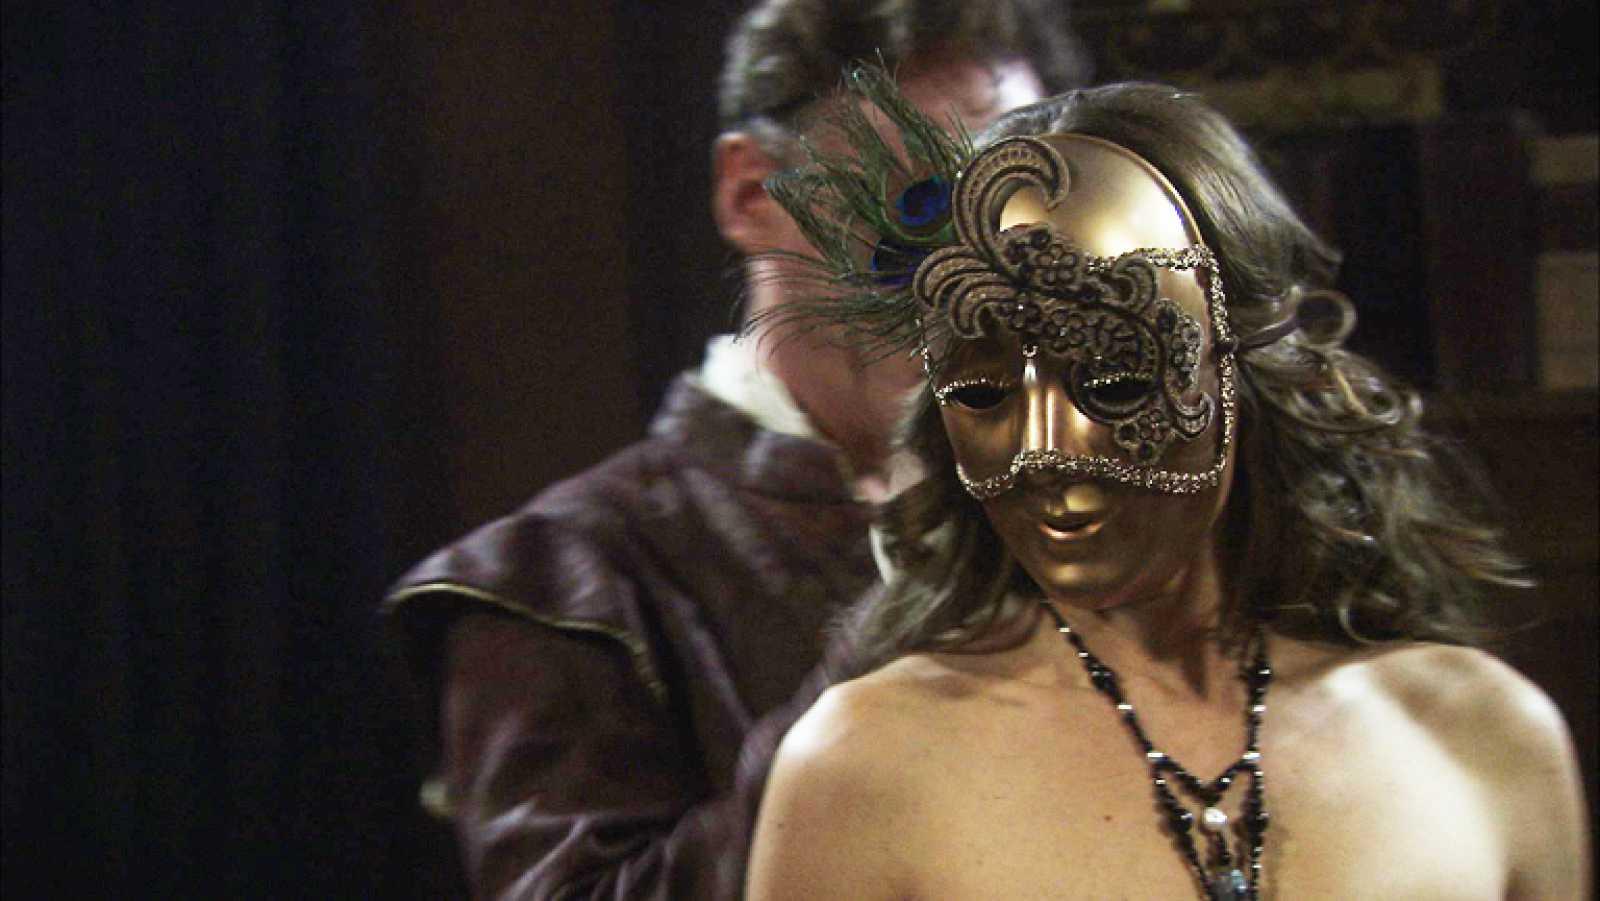 Ana Alonso Desnuda Águila roja - lucrecia muestra su cuerpo desnudo enmascarada